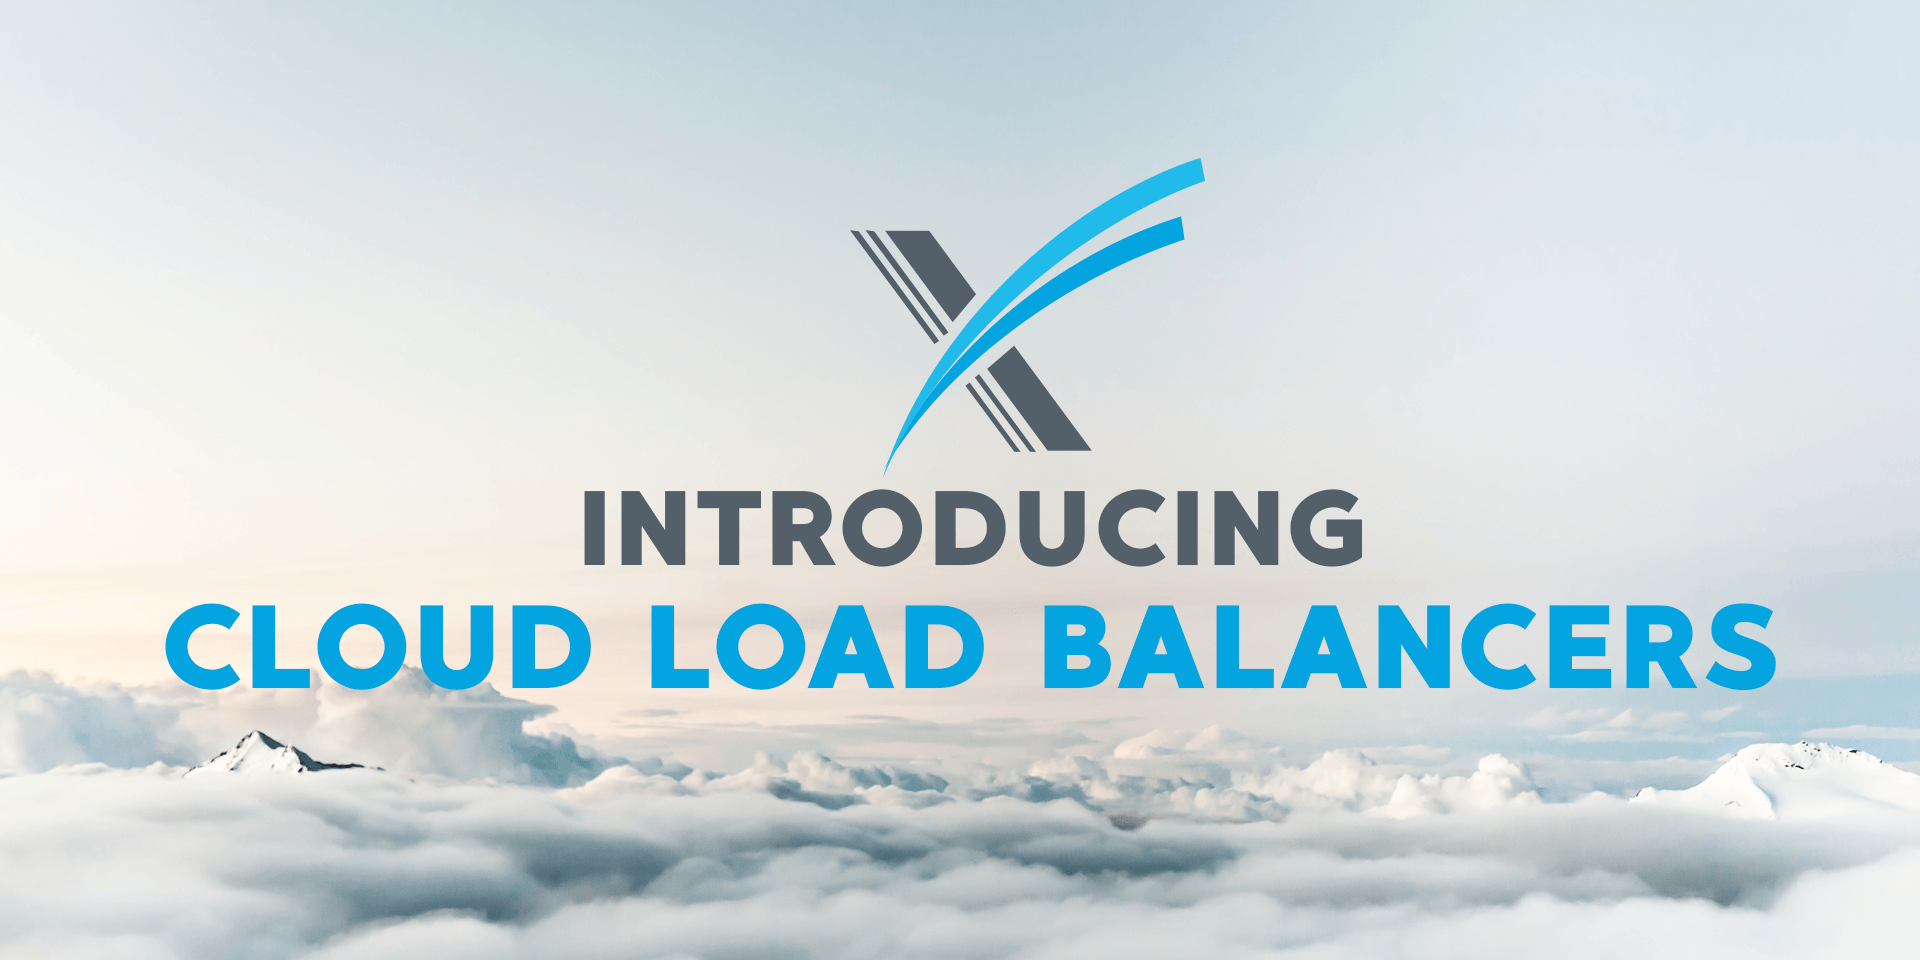 Introducing Cloud Load Balancers